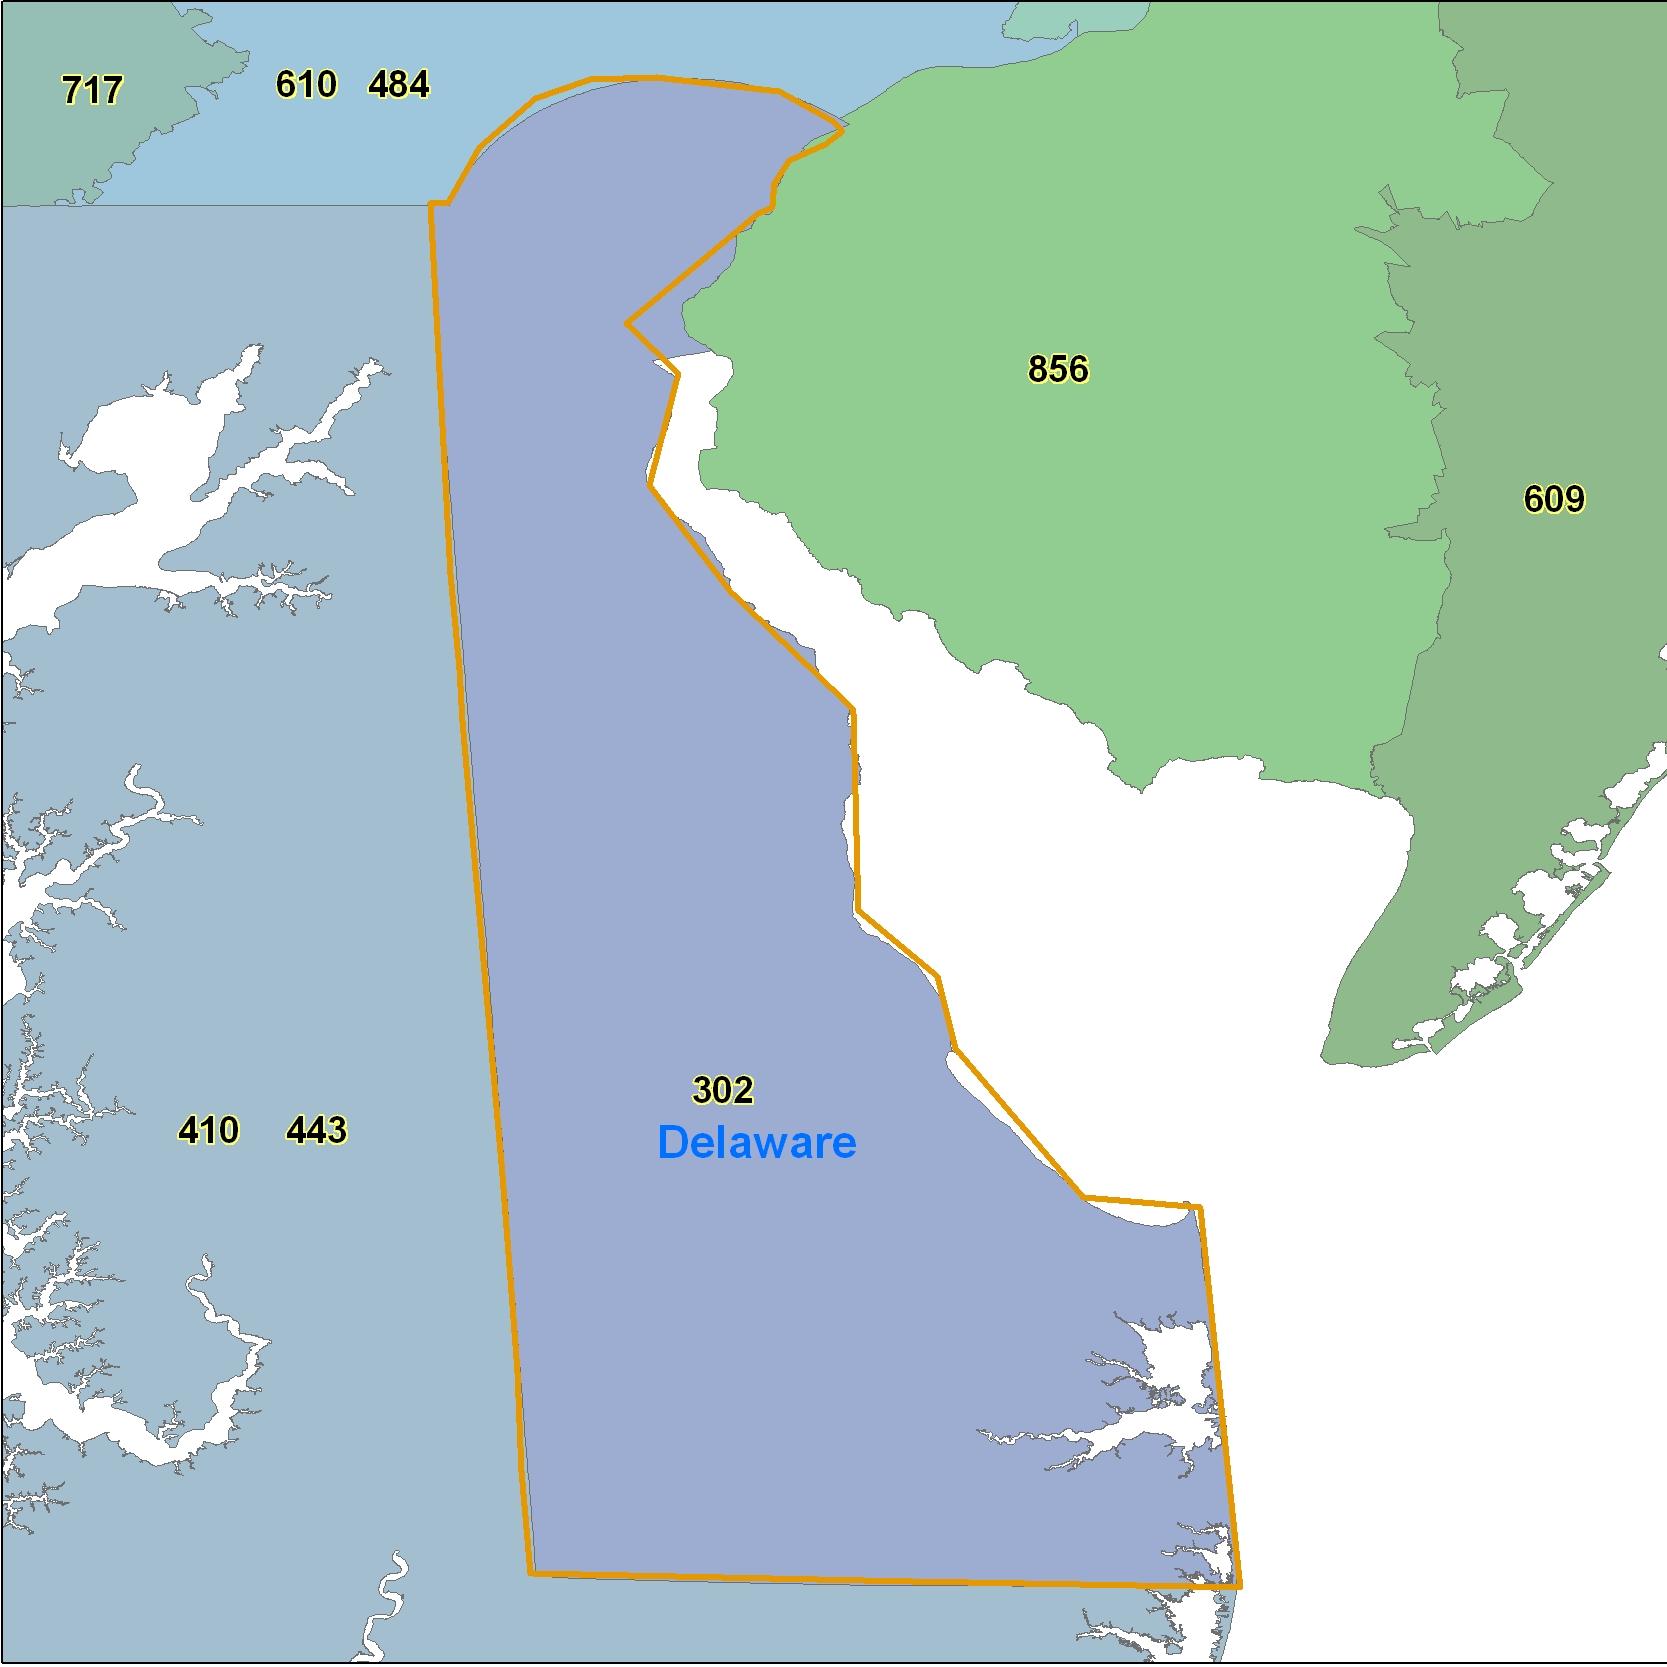 Delaware Area Code Maps Delaware Telephone Area Code Maps Free - Area code 302 map